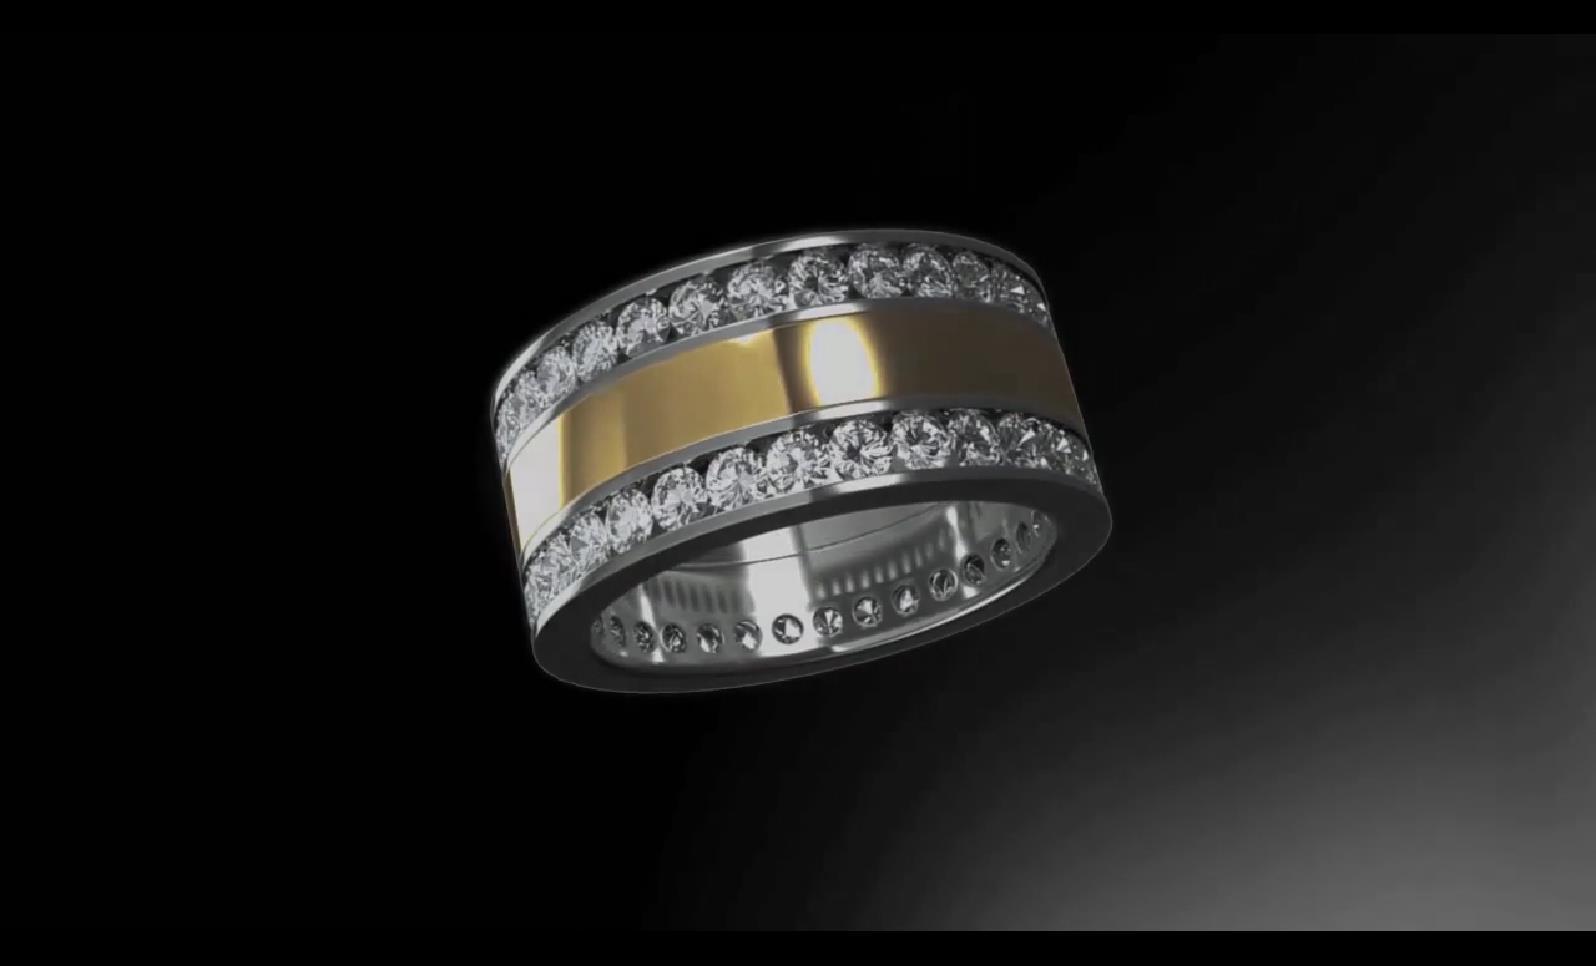 BS 023 BS 21 钻戒展示 珠宝工艺 珠宝设计 珠宝展示_5